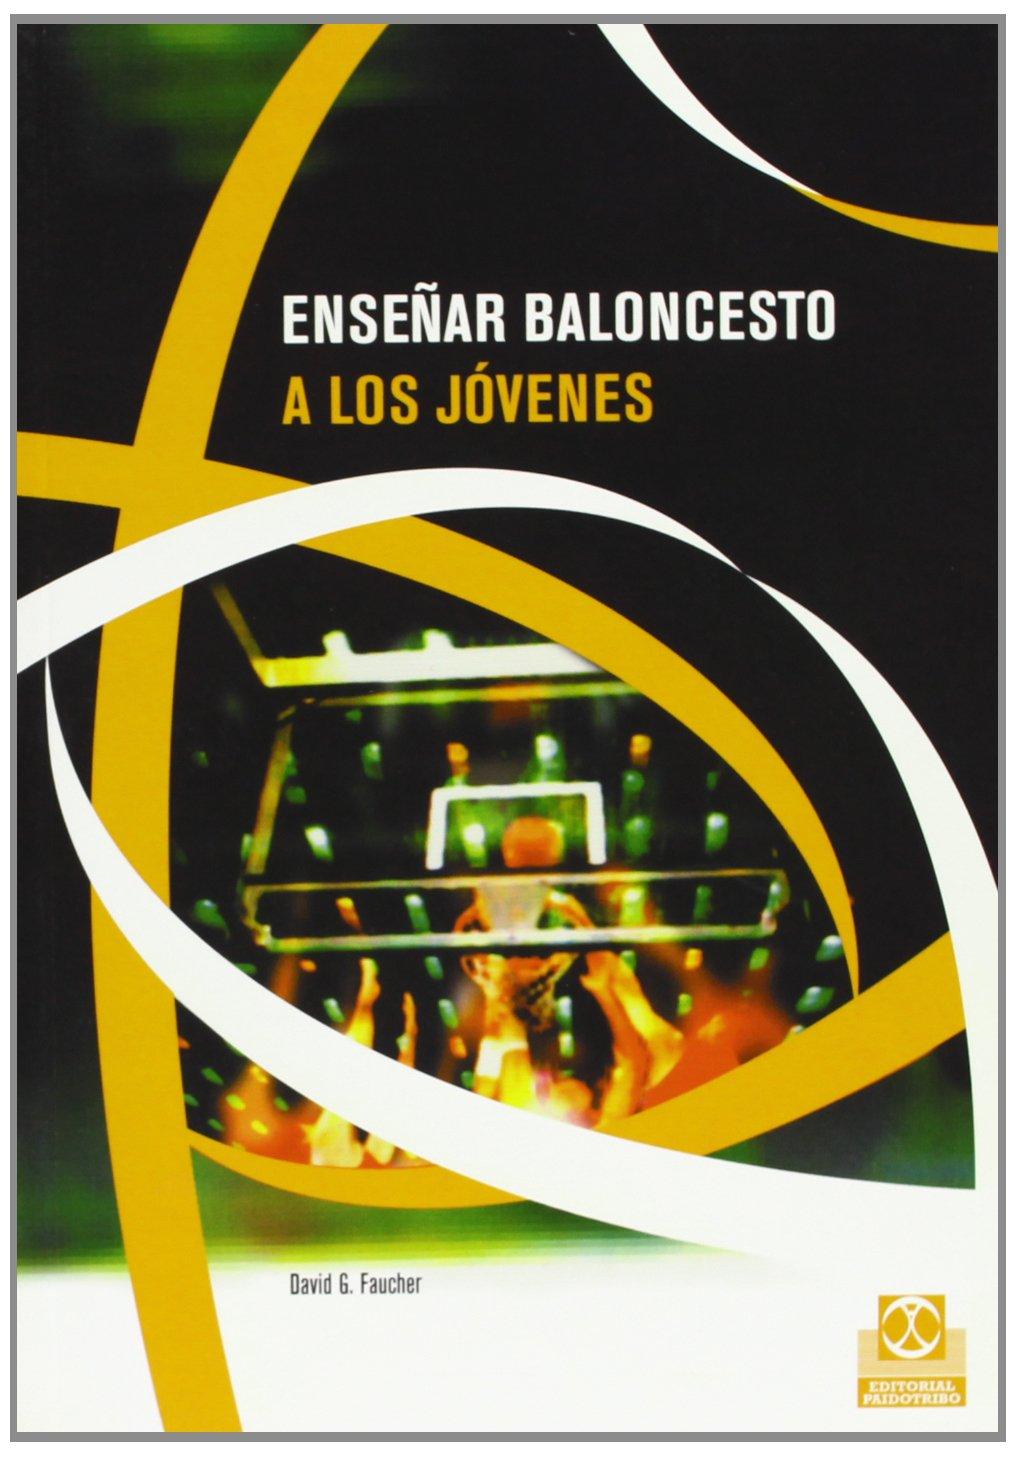 Ensenar Baloncesto a los Jovenes (Deportes) Tapa blanda – 23 oct 2007 David G. Faucher Paidotribo 8480196513 859417